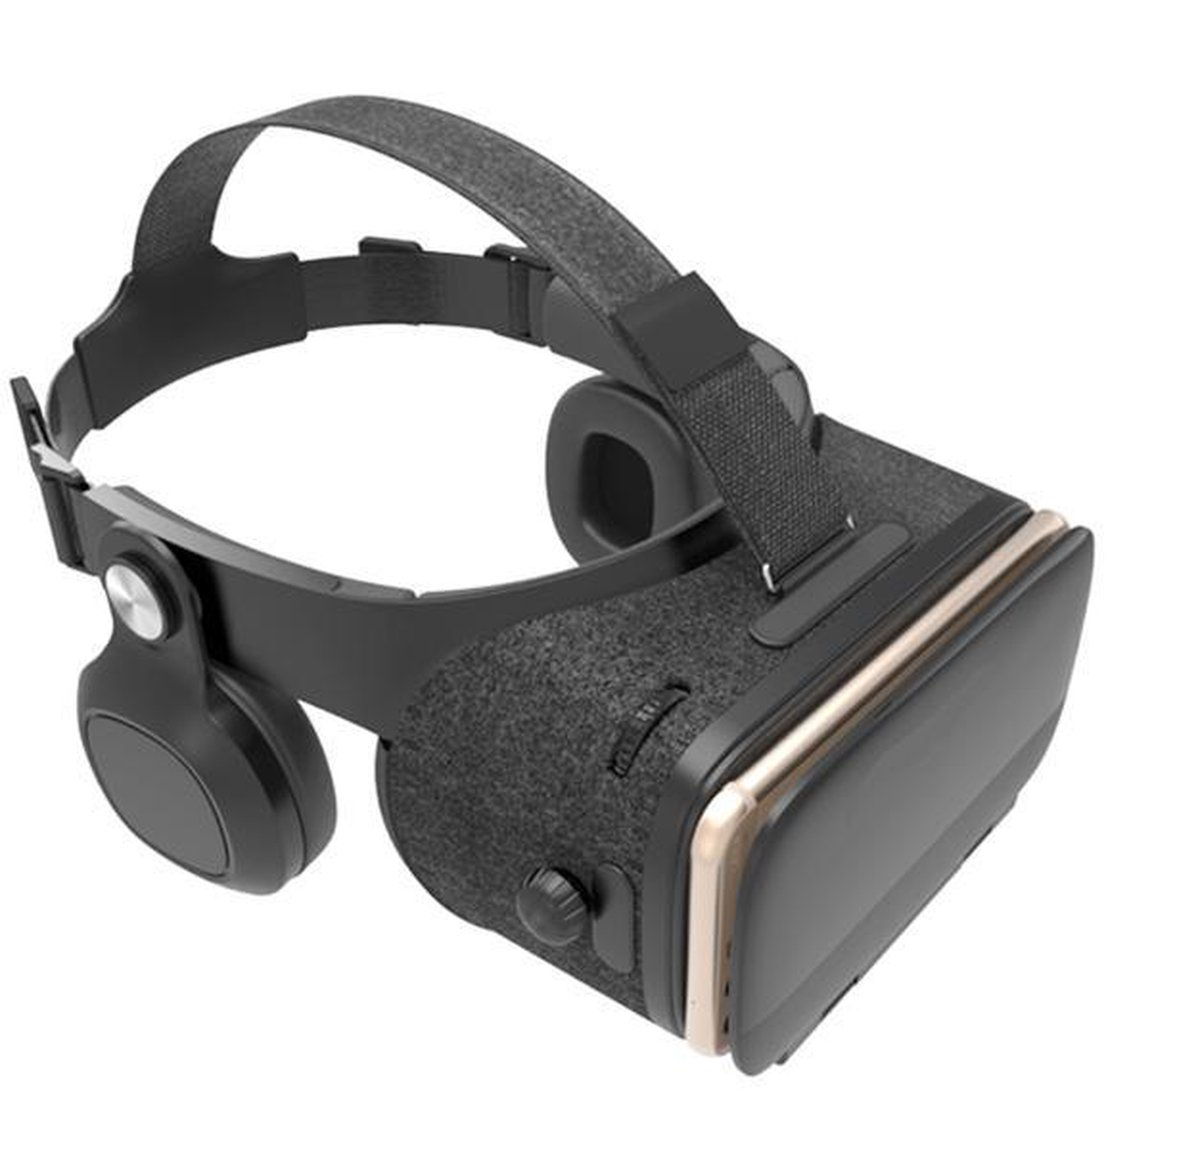 DrPhone VRZ5 - IMAX 3D Virtual Reality Bril - Ingebouwde Surround Sound VR Hoofdtelefoon Koptelefoon